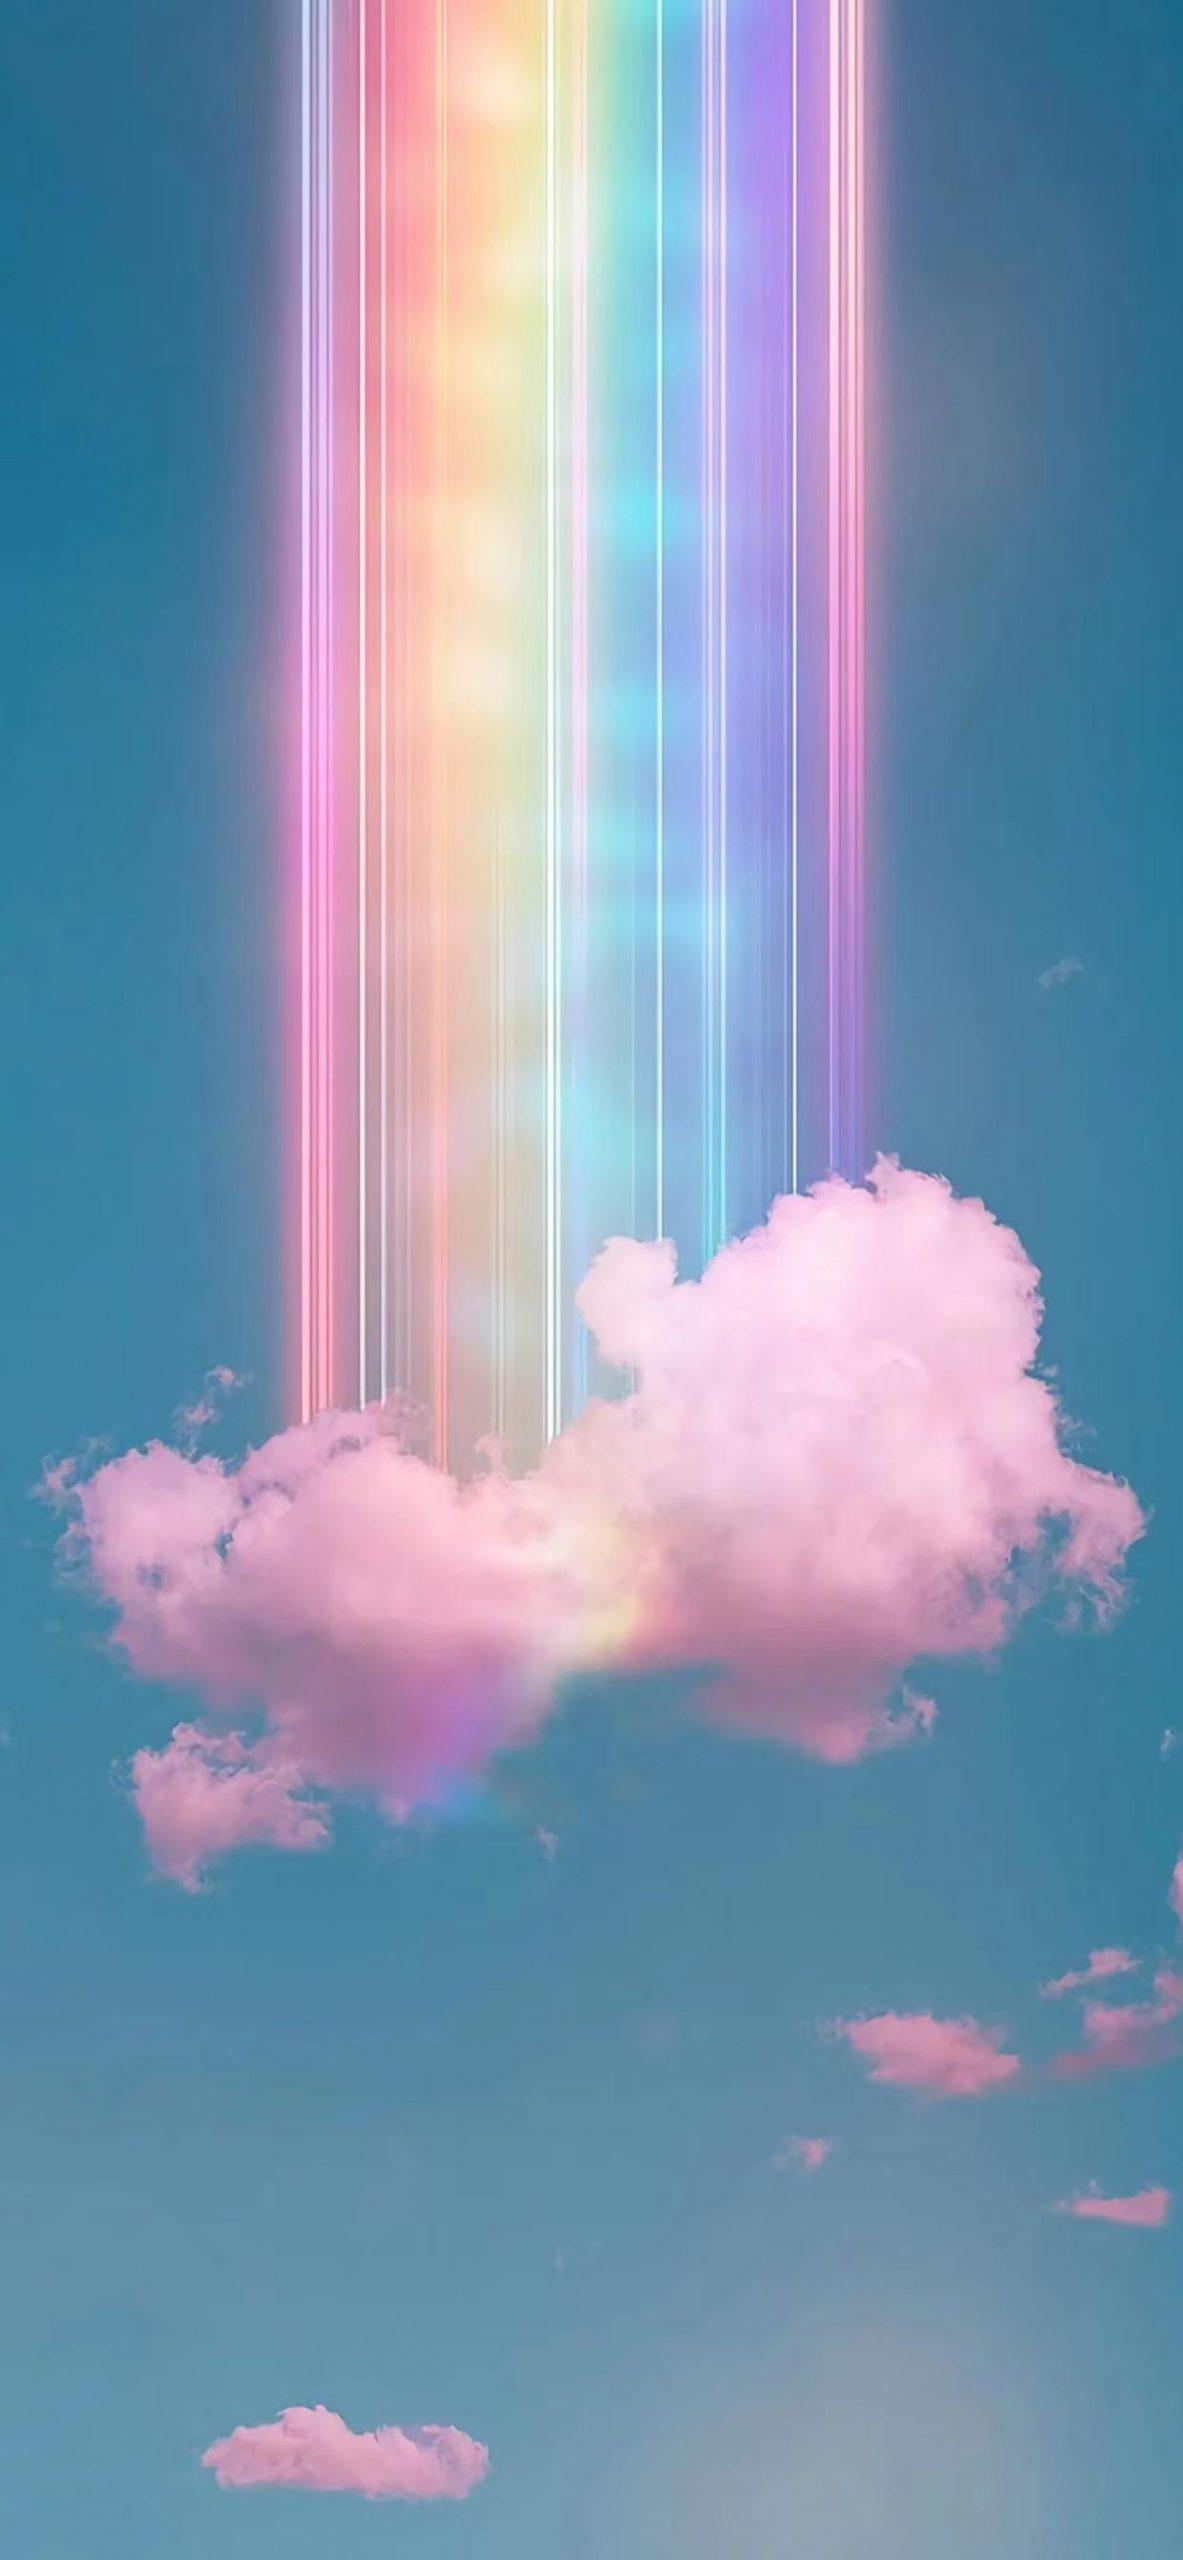 Rainbow Aesthetic Wallpaper   EnJpg